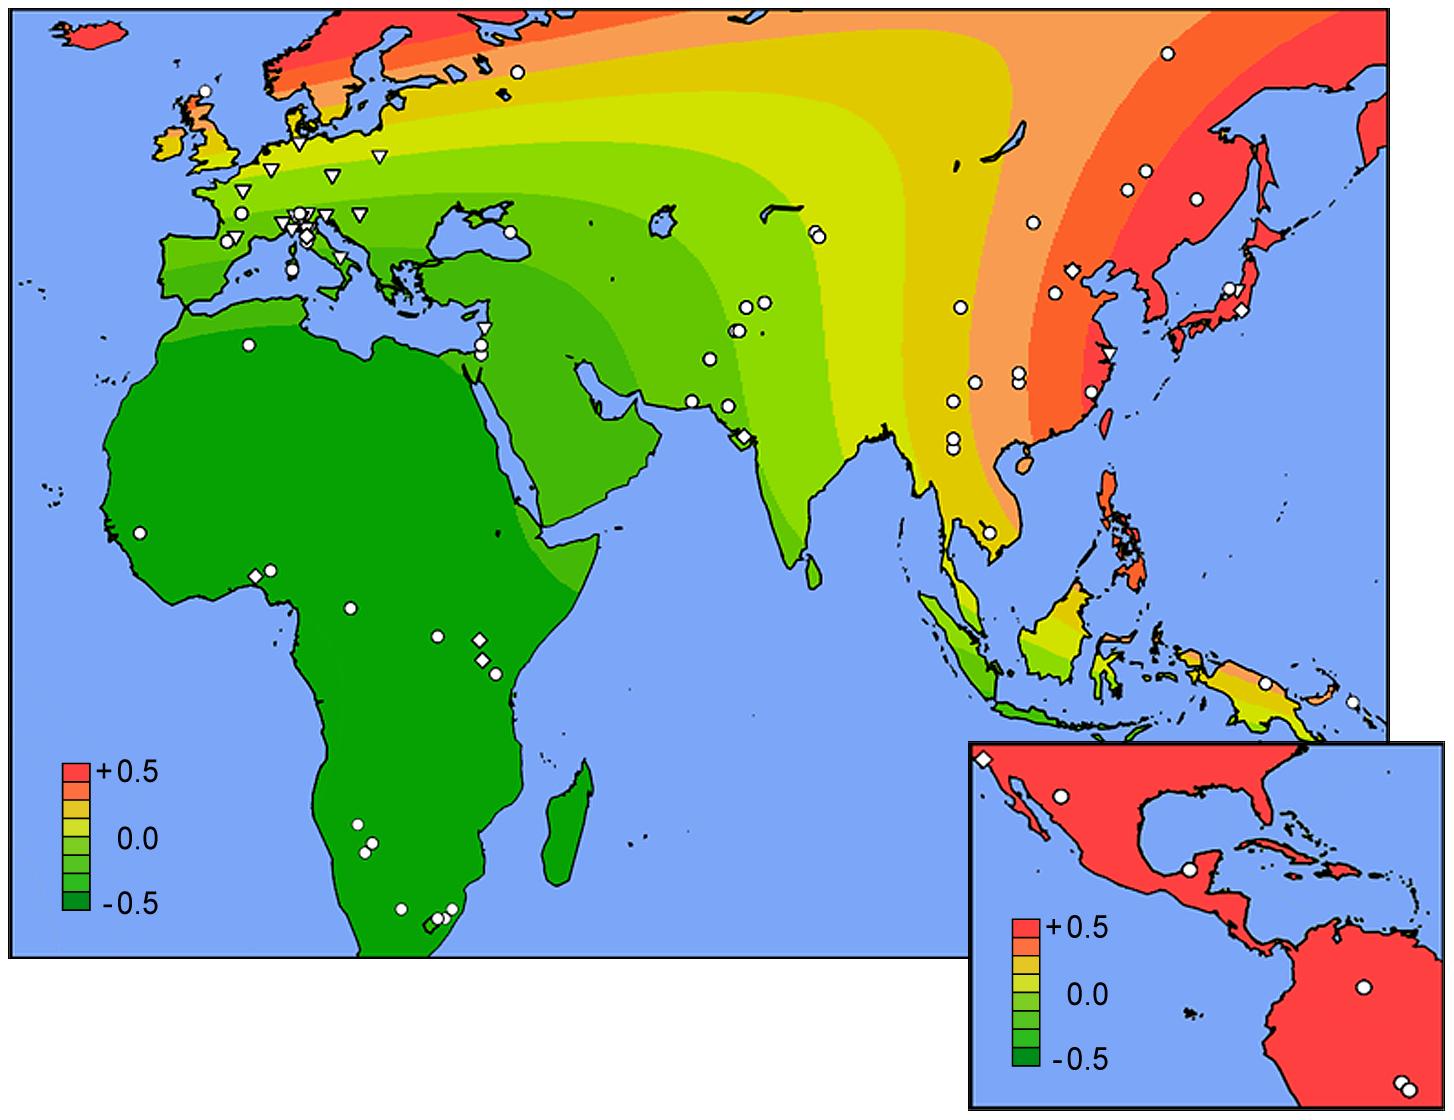 Worldwide geospatial risk analysis.